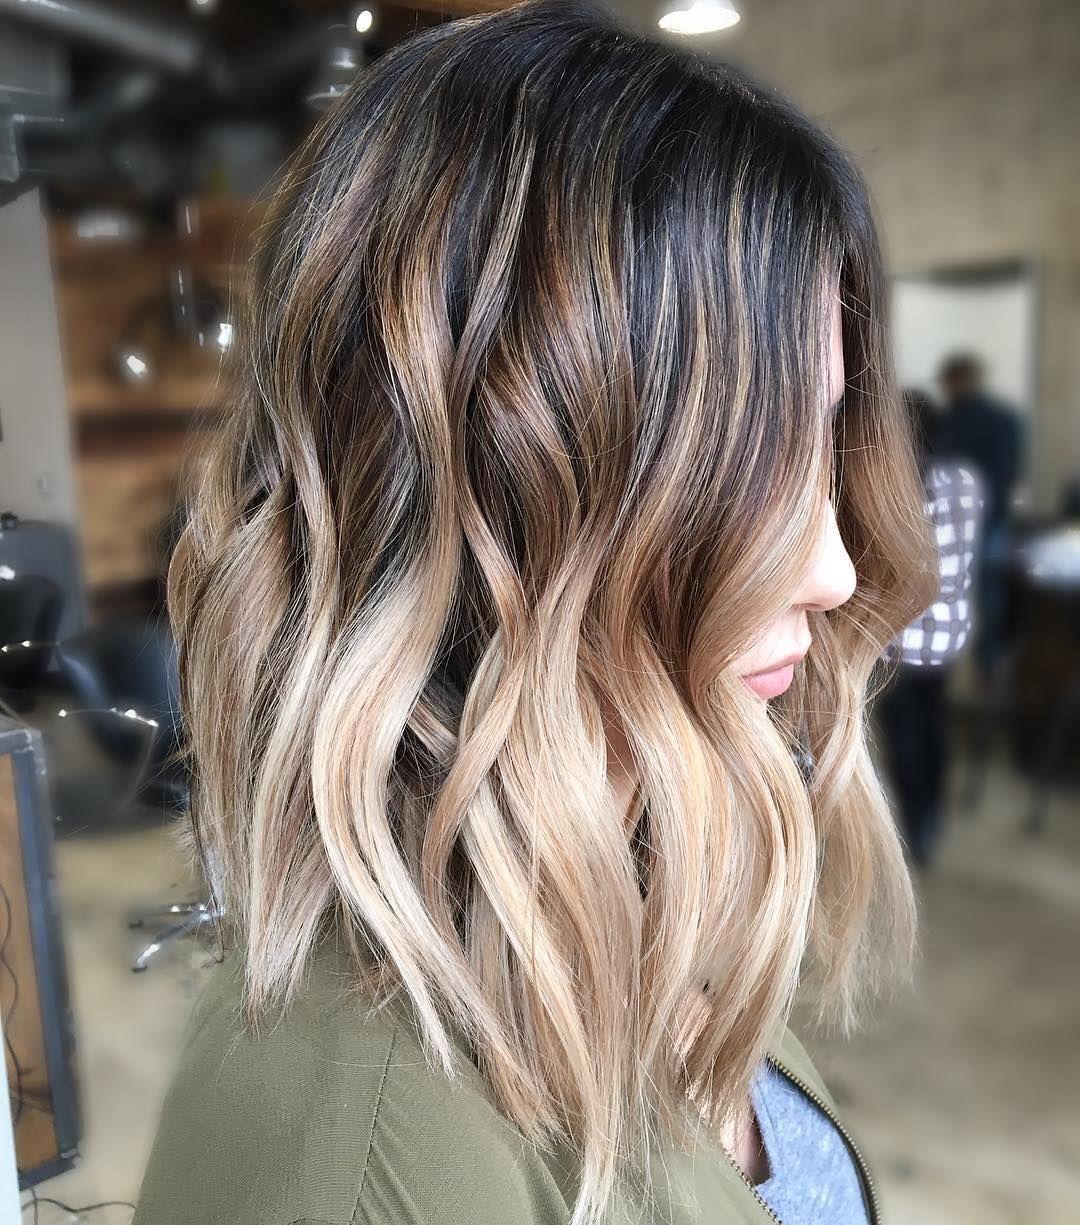 Pretty Balayage Ombre Hair Styles For Shoulder Length Hair Medium Haircut Color Ideas Hair Styles Balayage Hair Hair Color Balayage